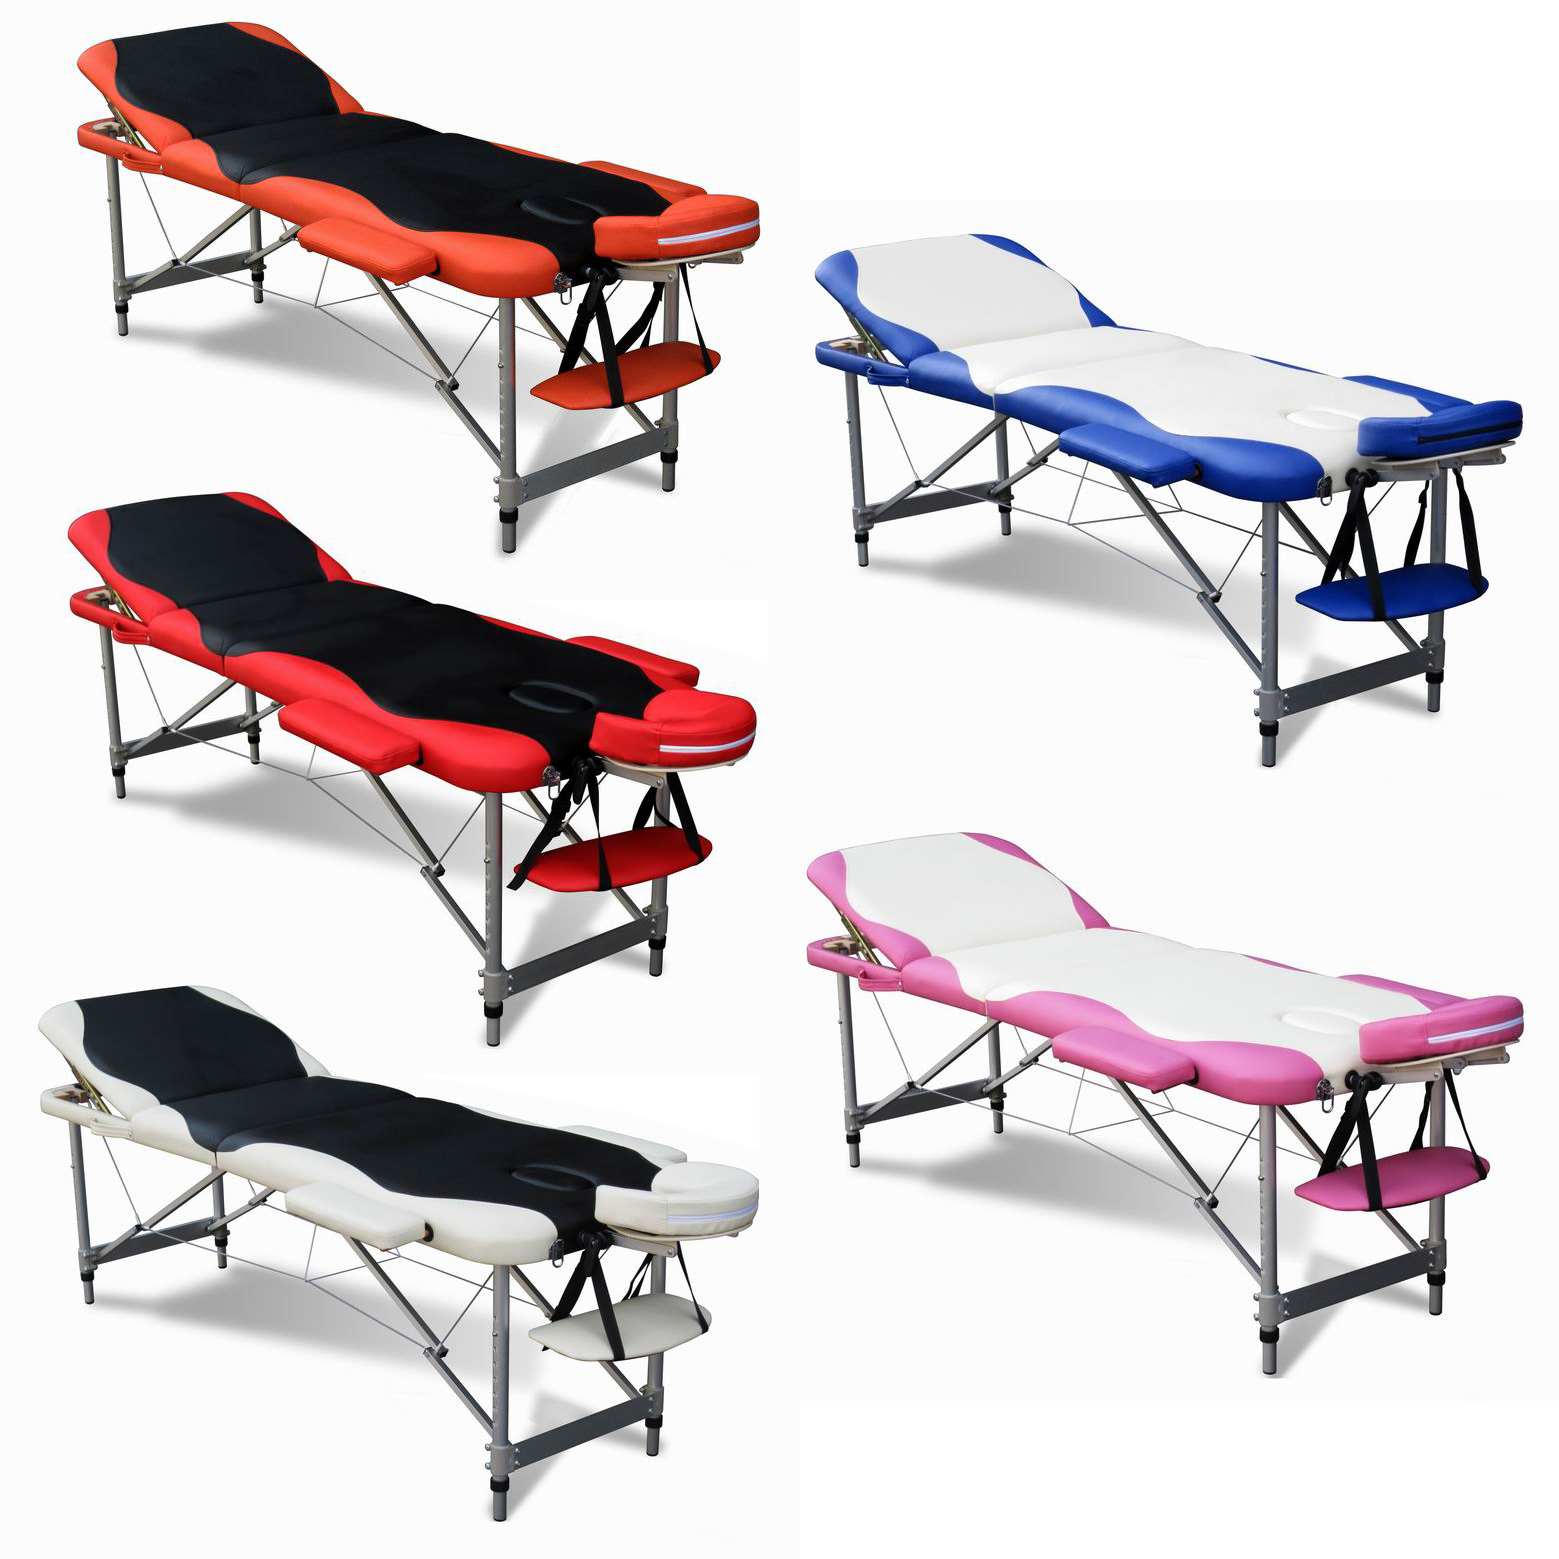 Luxury Lightweight Portable Folding Massage Table Bed